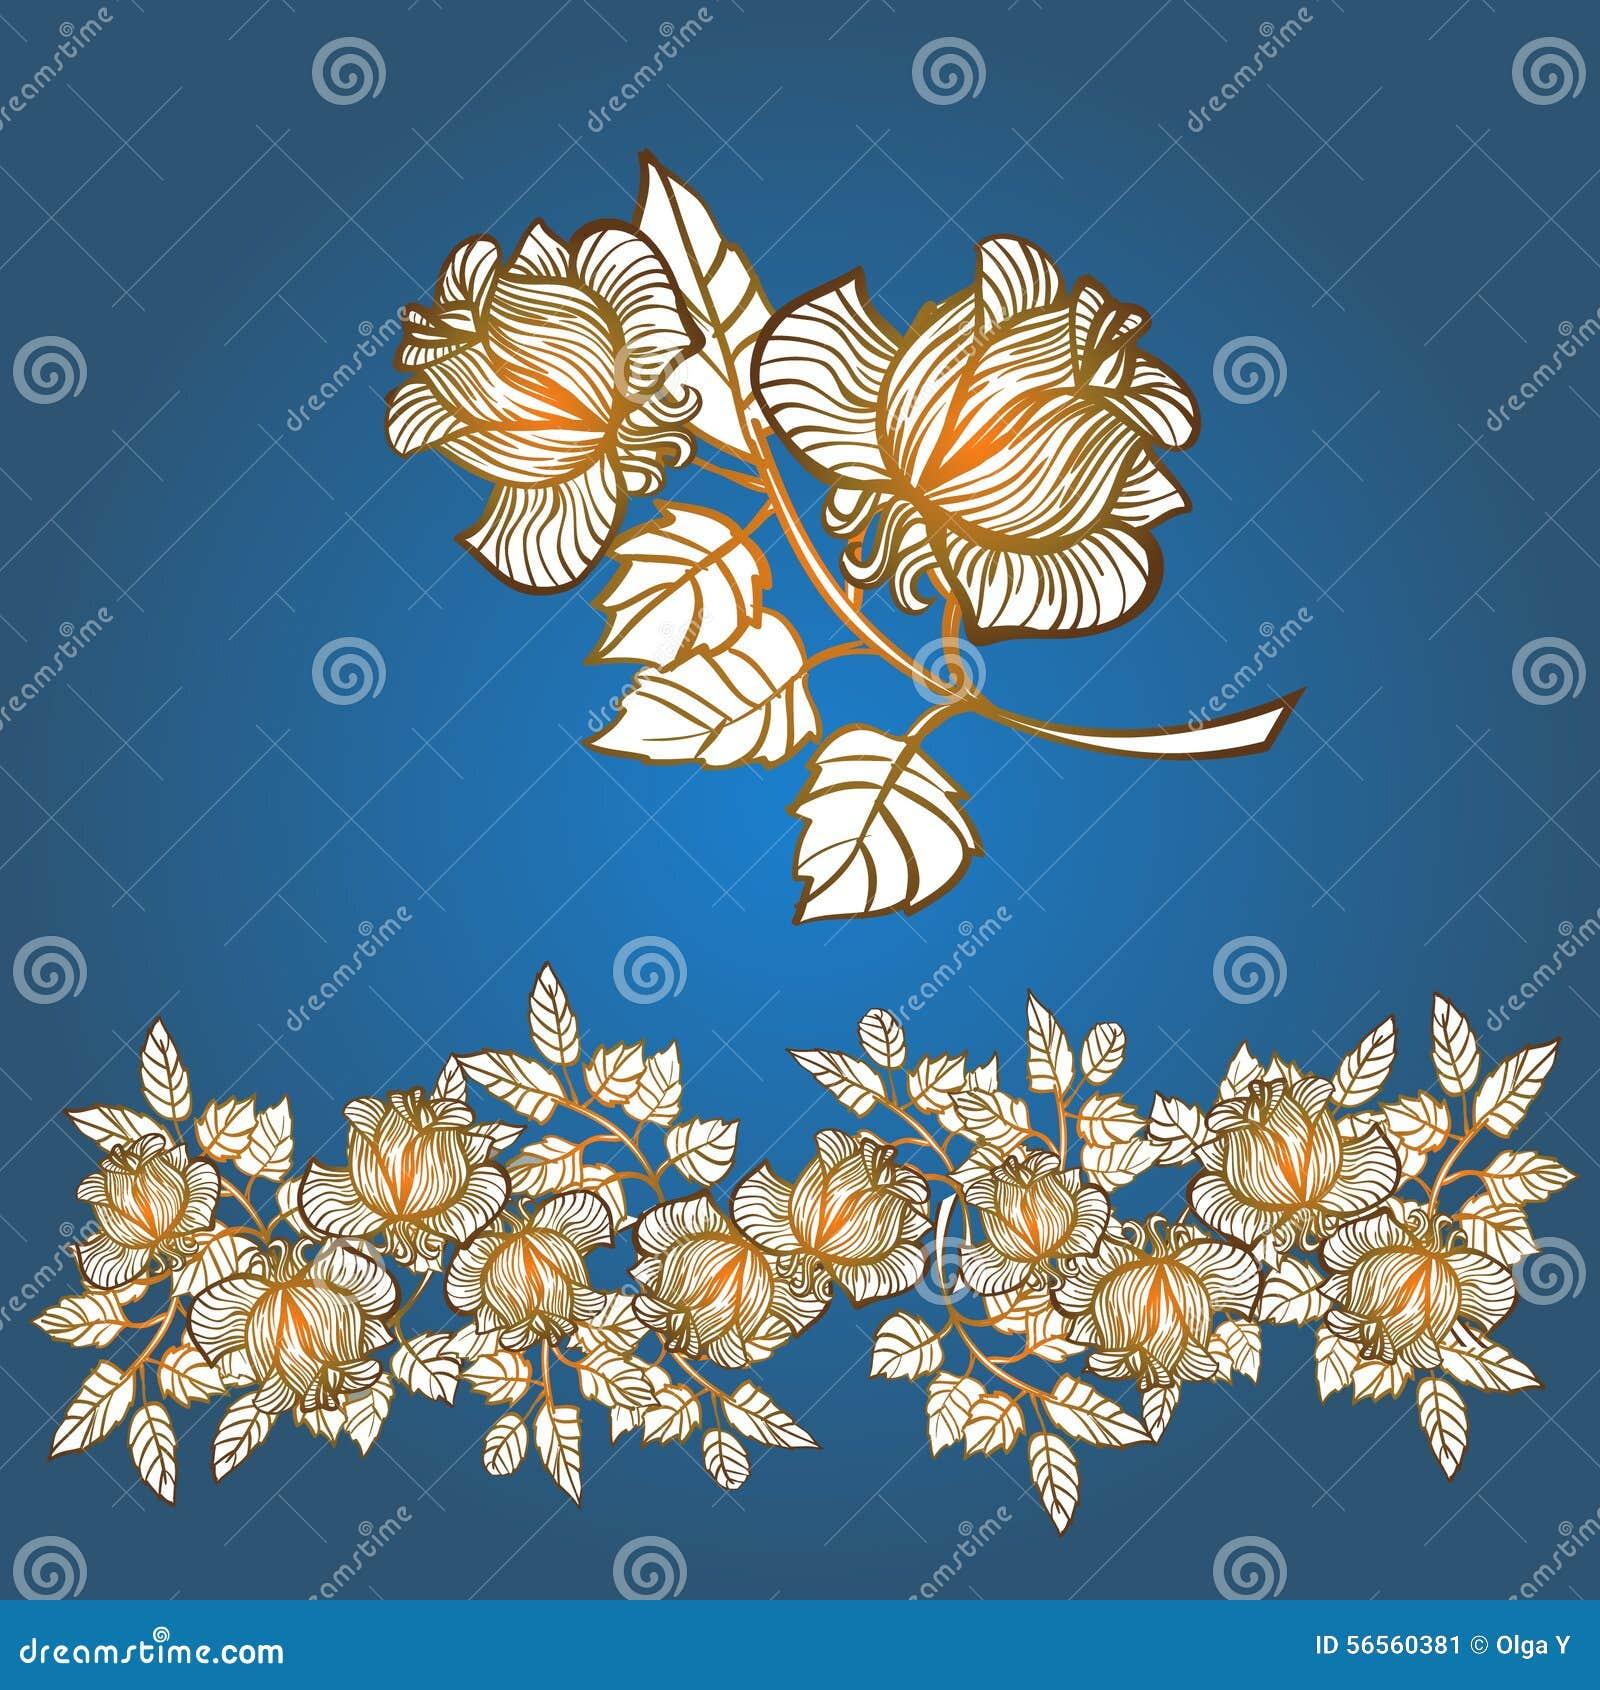 Download σαν χρώματος σχεδίου Vectorized επιθυμία κυλίνδρων στοιχείων Floral εσείς τριαντάφυλλα σύνορα Διανυσματική απεικόνιση - εικονογραφία από παλαιός, γραφικός: 56560381